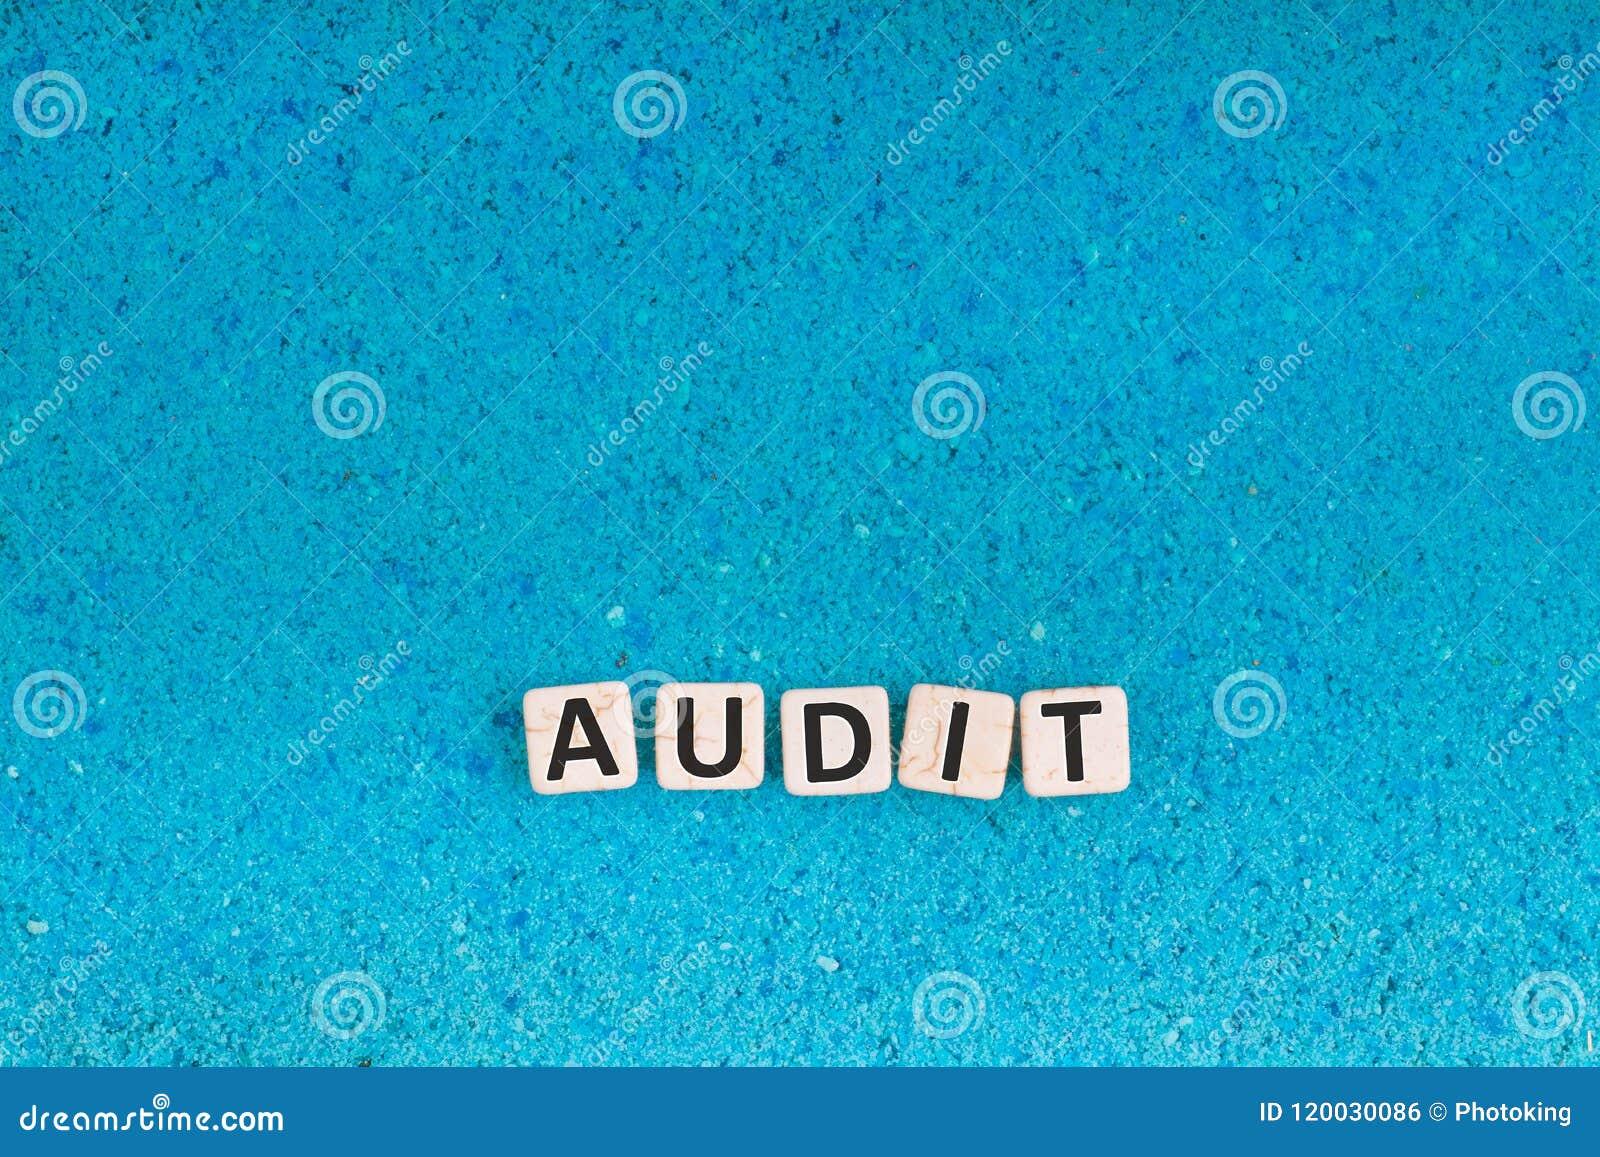 Audit word on stone